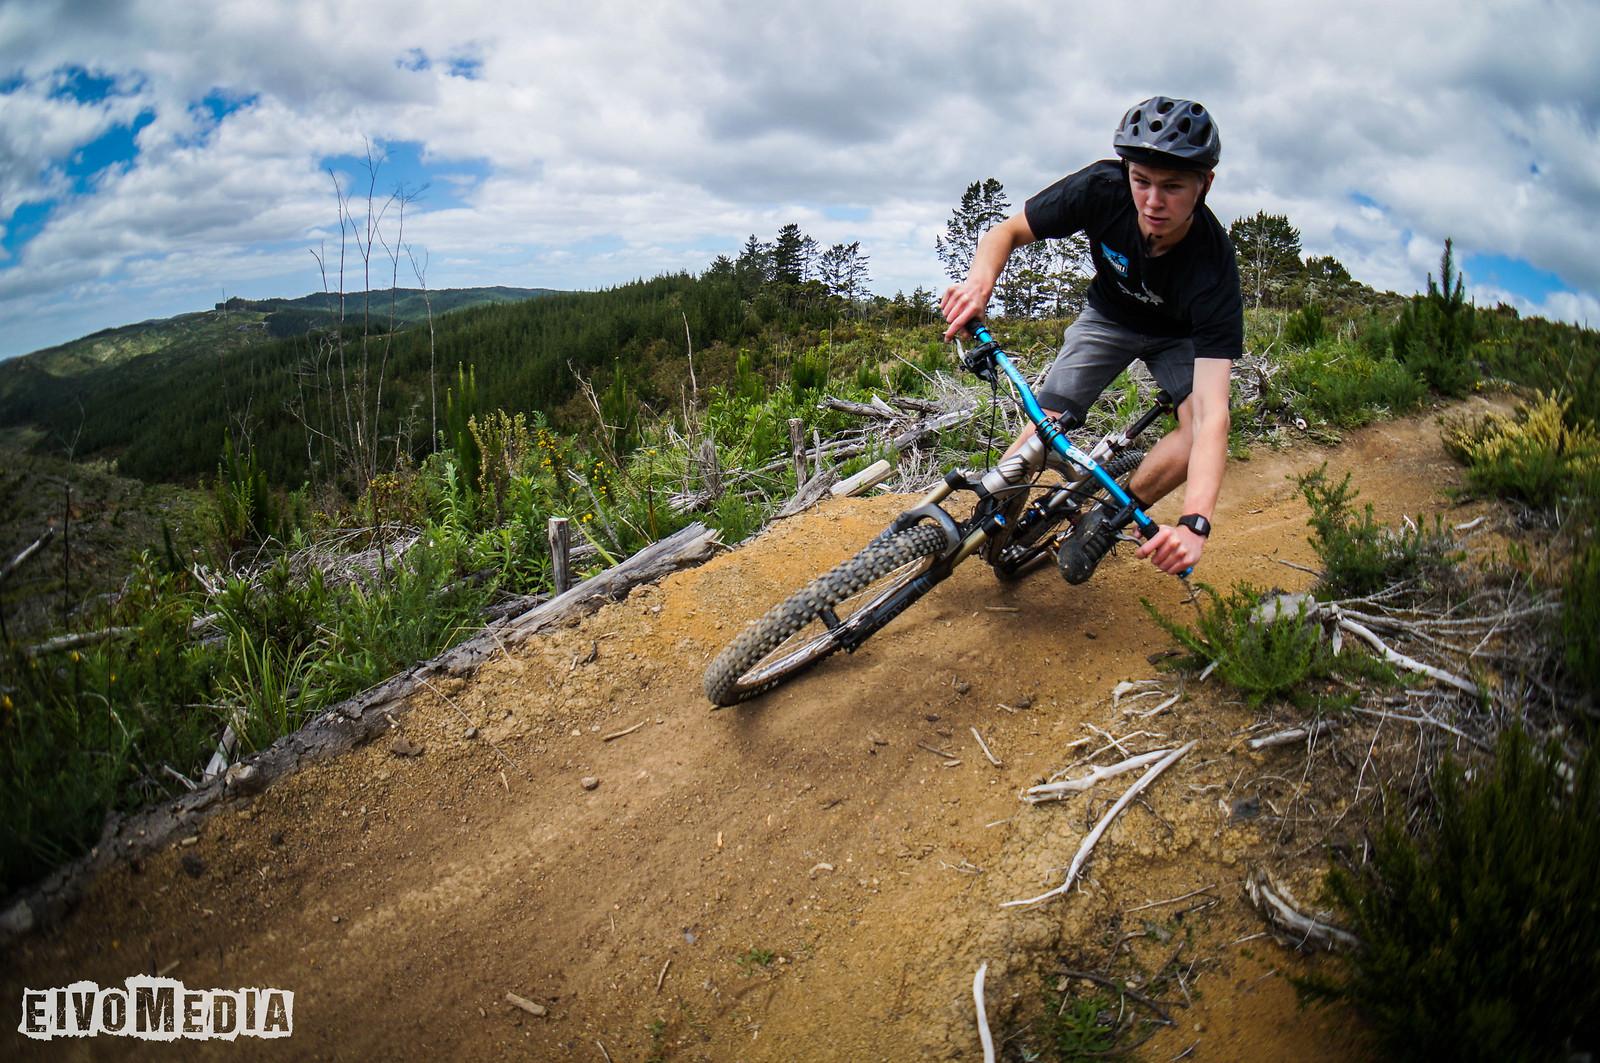 WCRC - Hunter Flatz -3 - EIVOMEDIA - Mountain Biking Pictures - Vital MTB